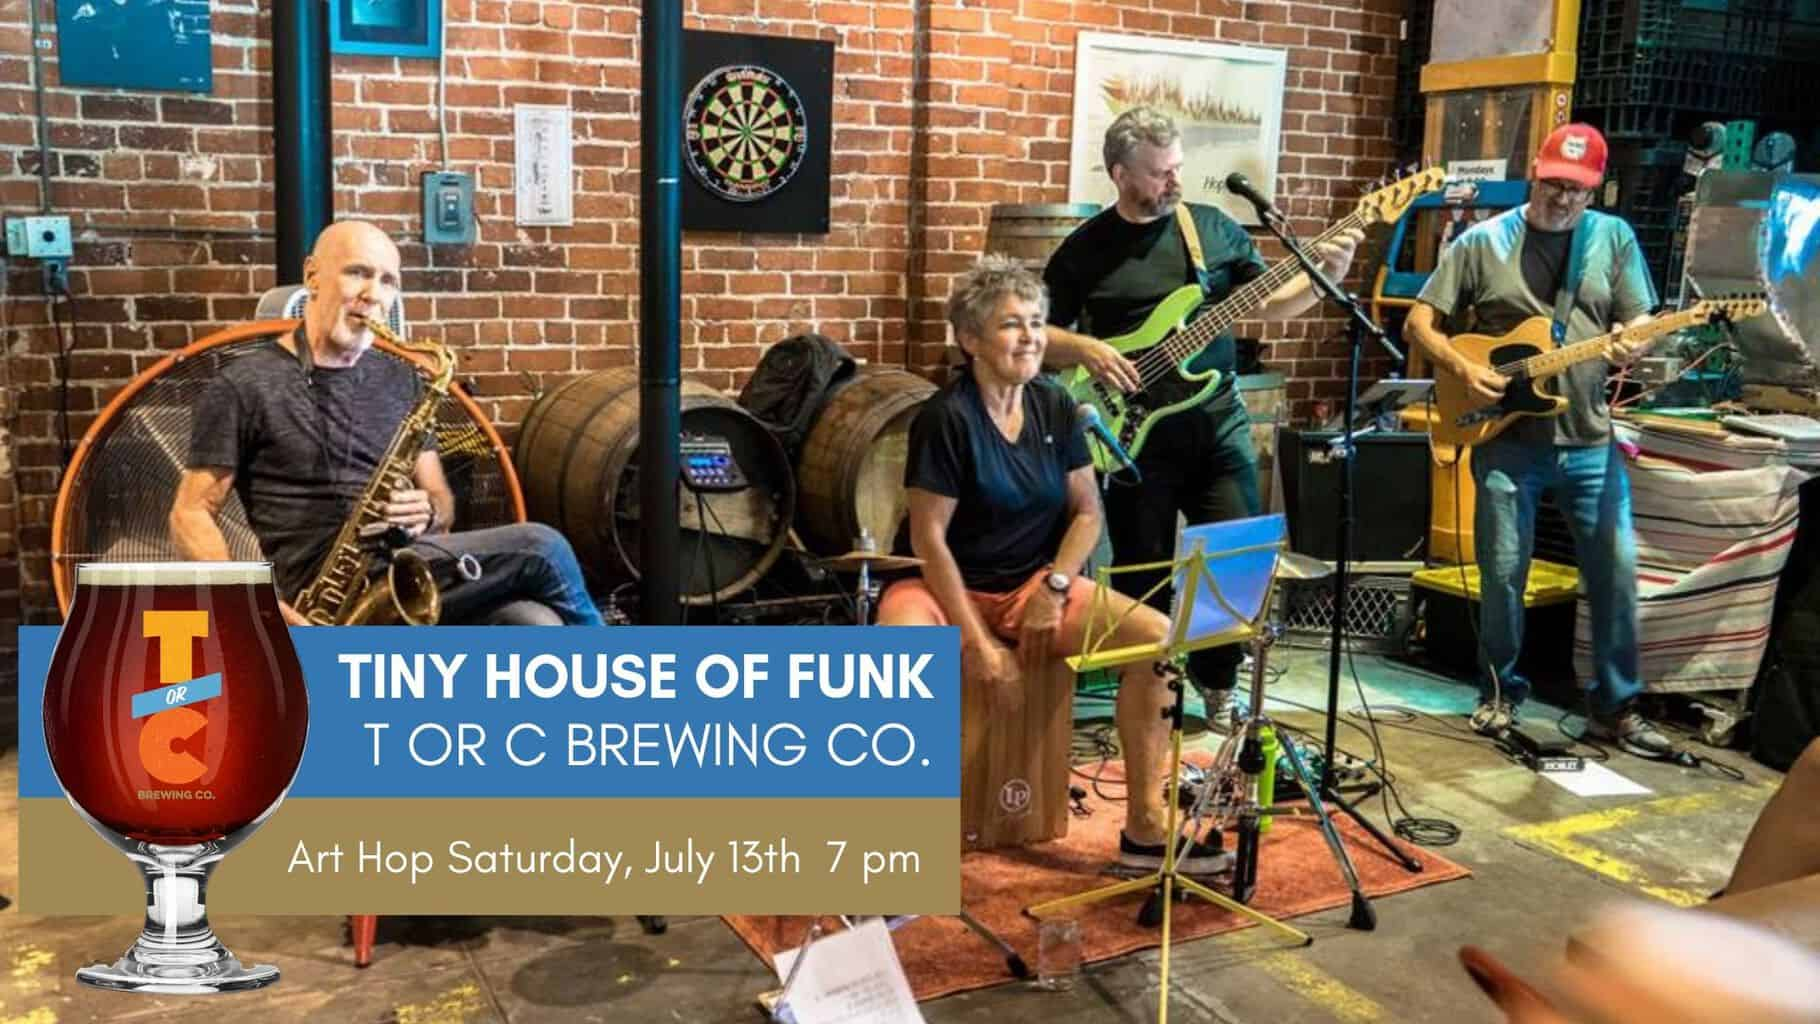 Tiny House of Funk